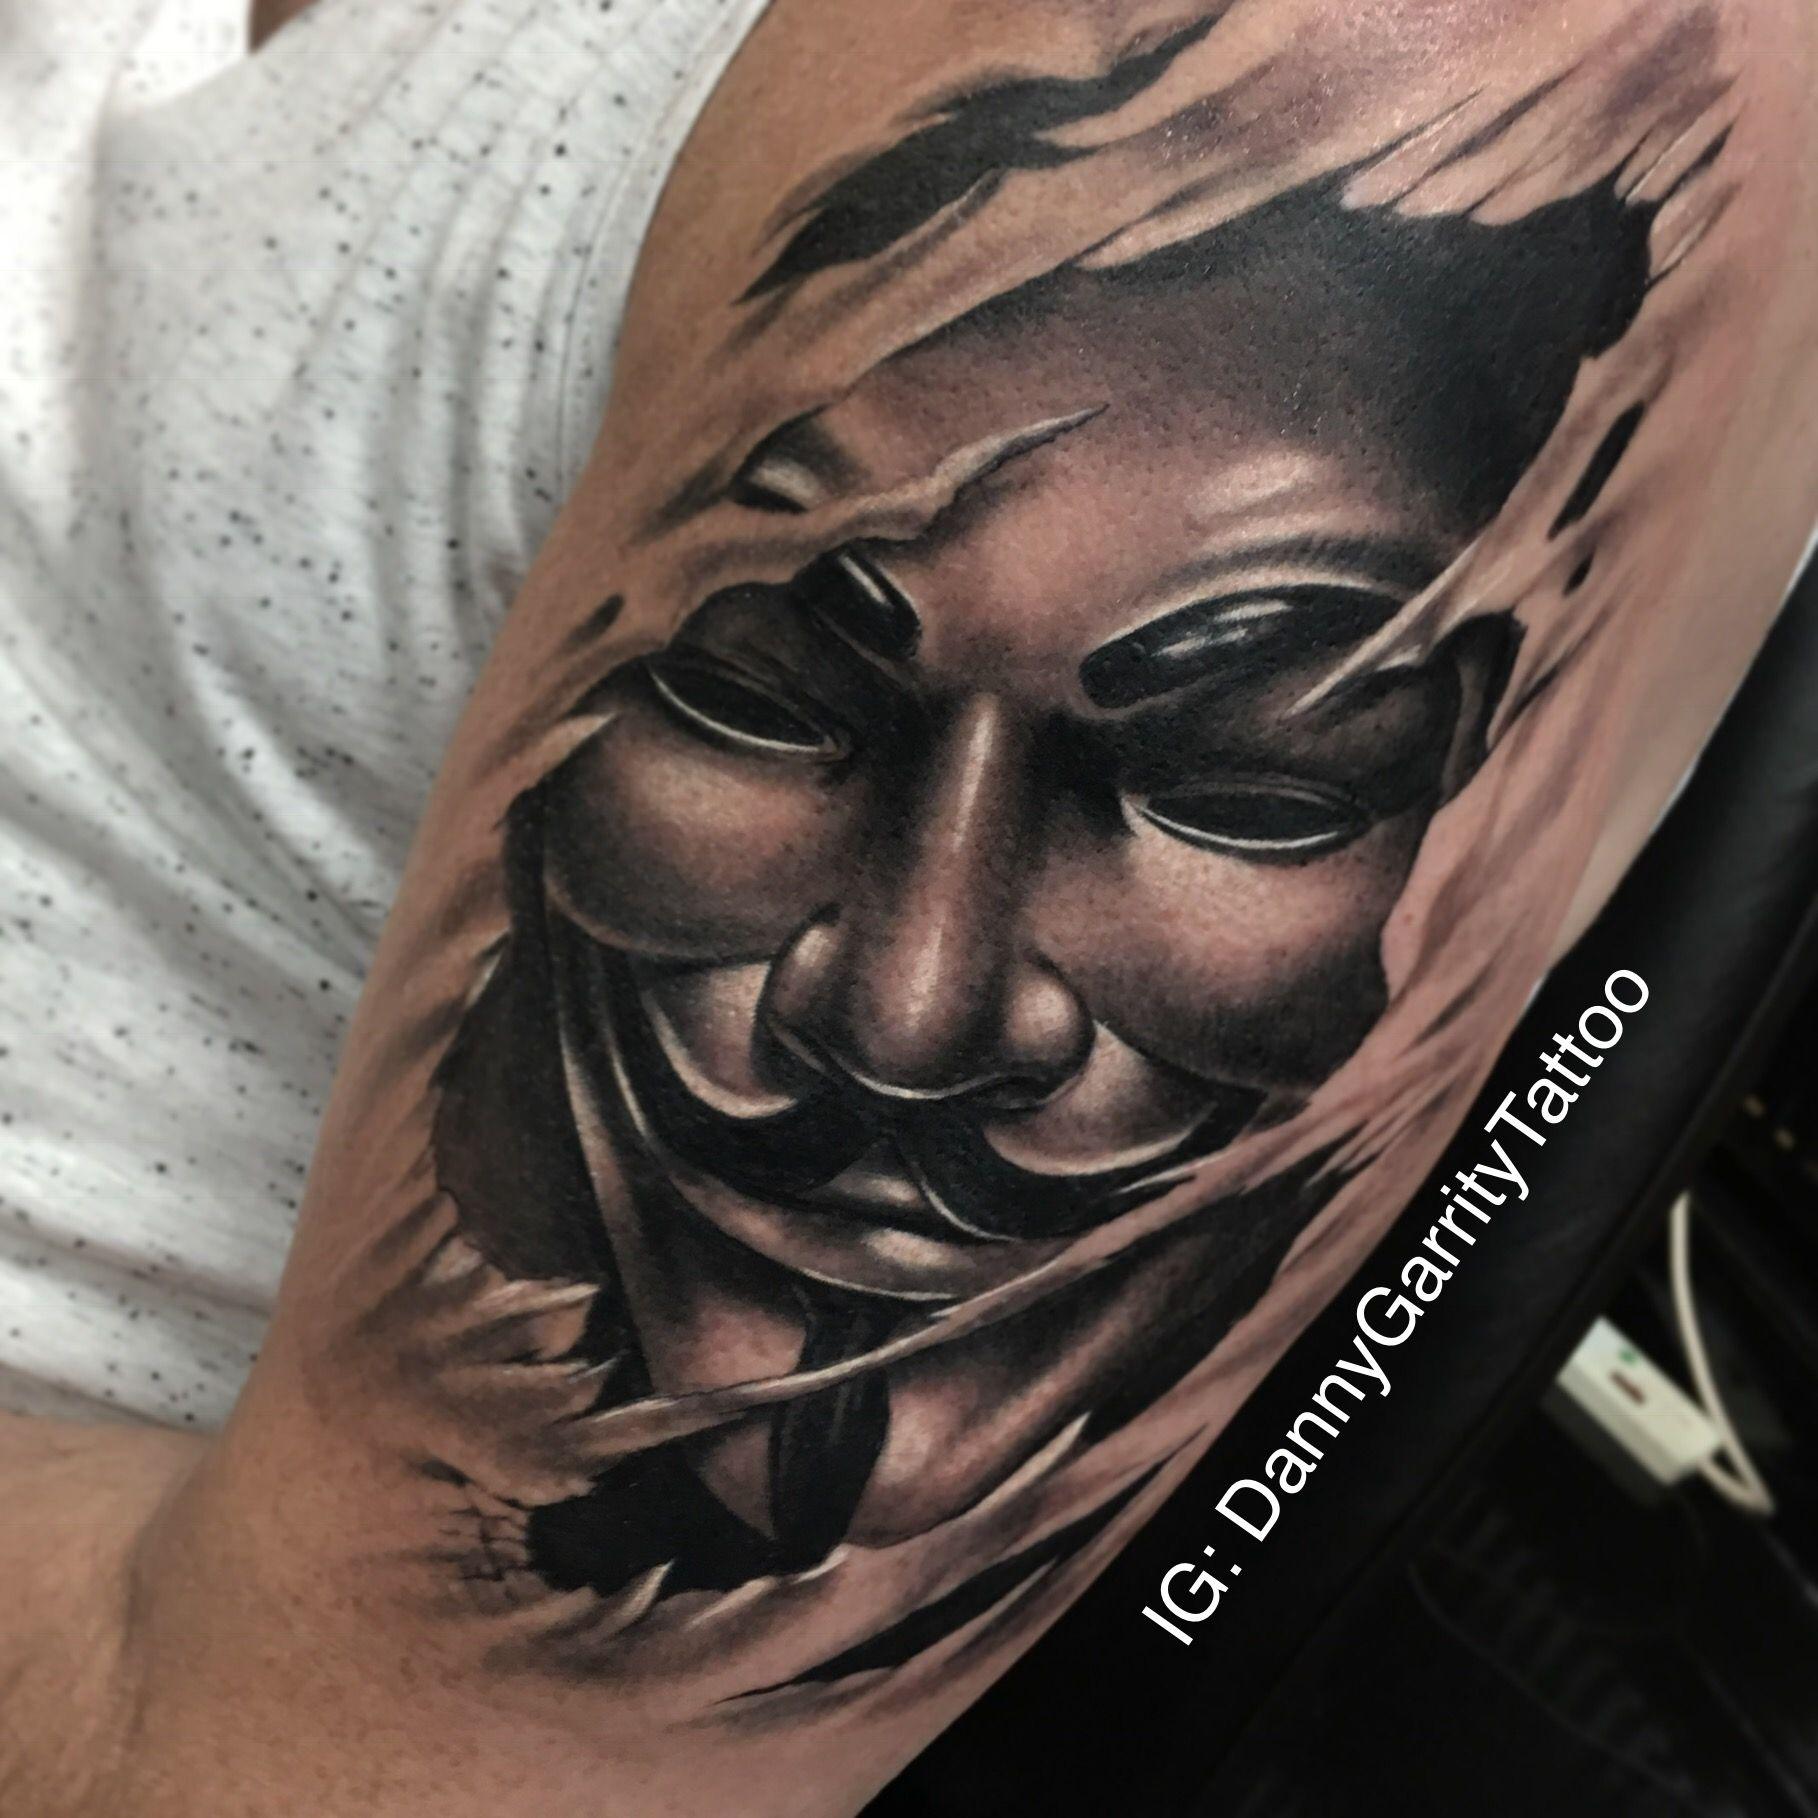 V For Vendetta Mask Skin Rip Tattoo Rip Tattoo Ripped Skin Tattoo Vendetta Tattoo